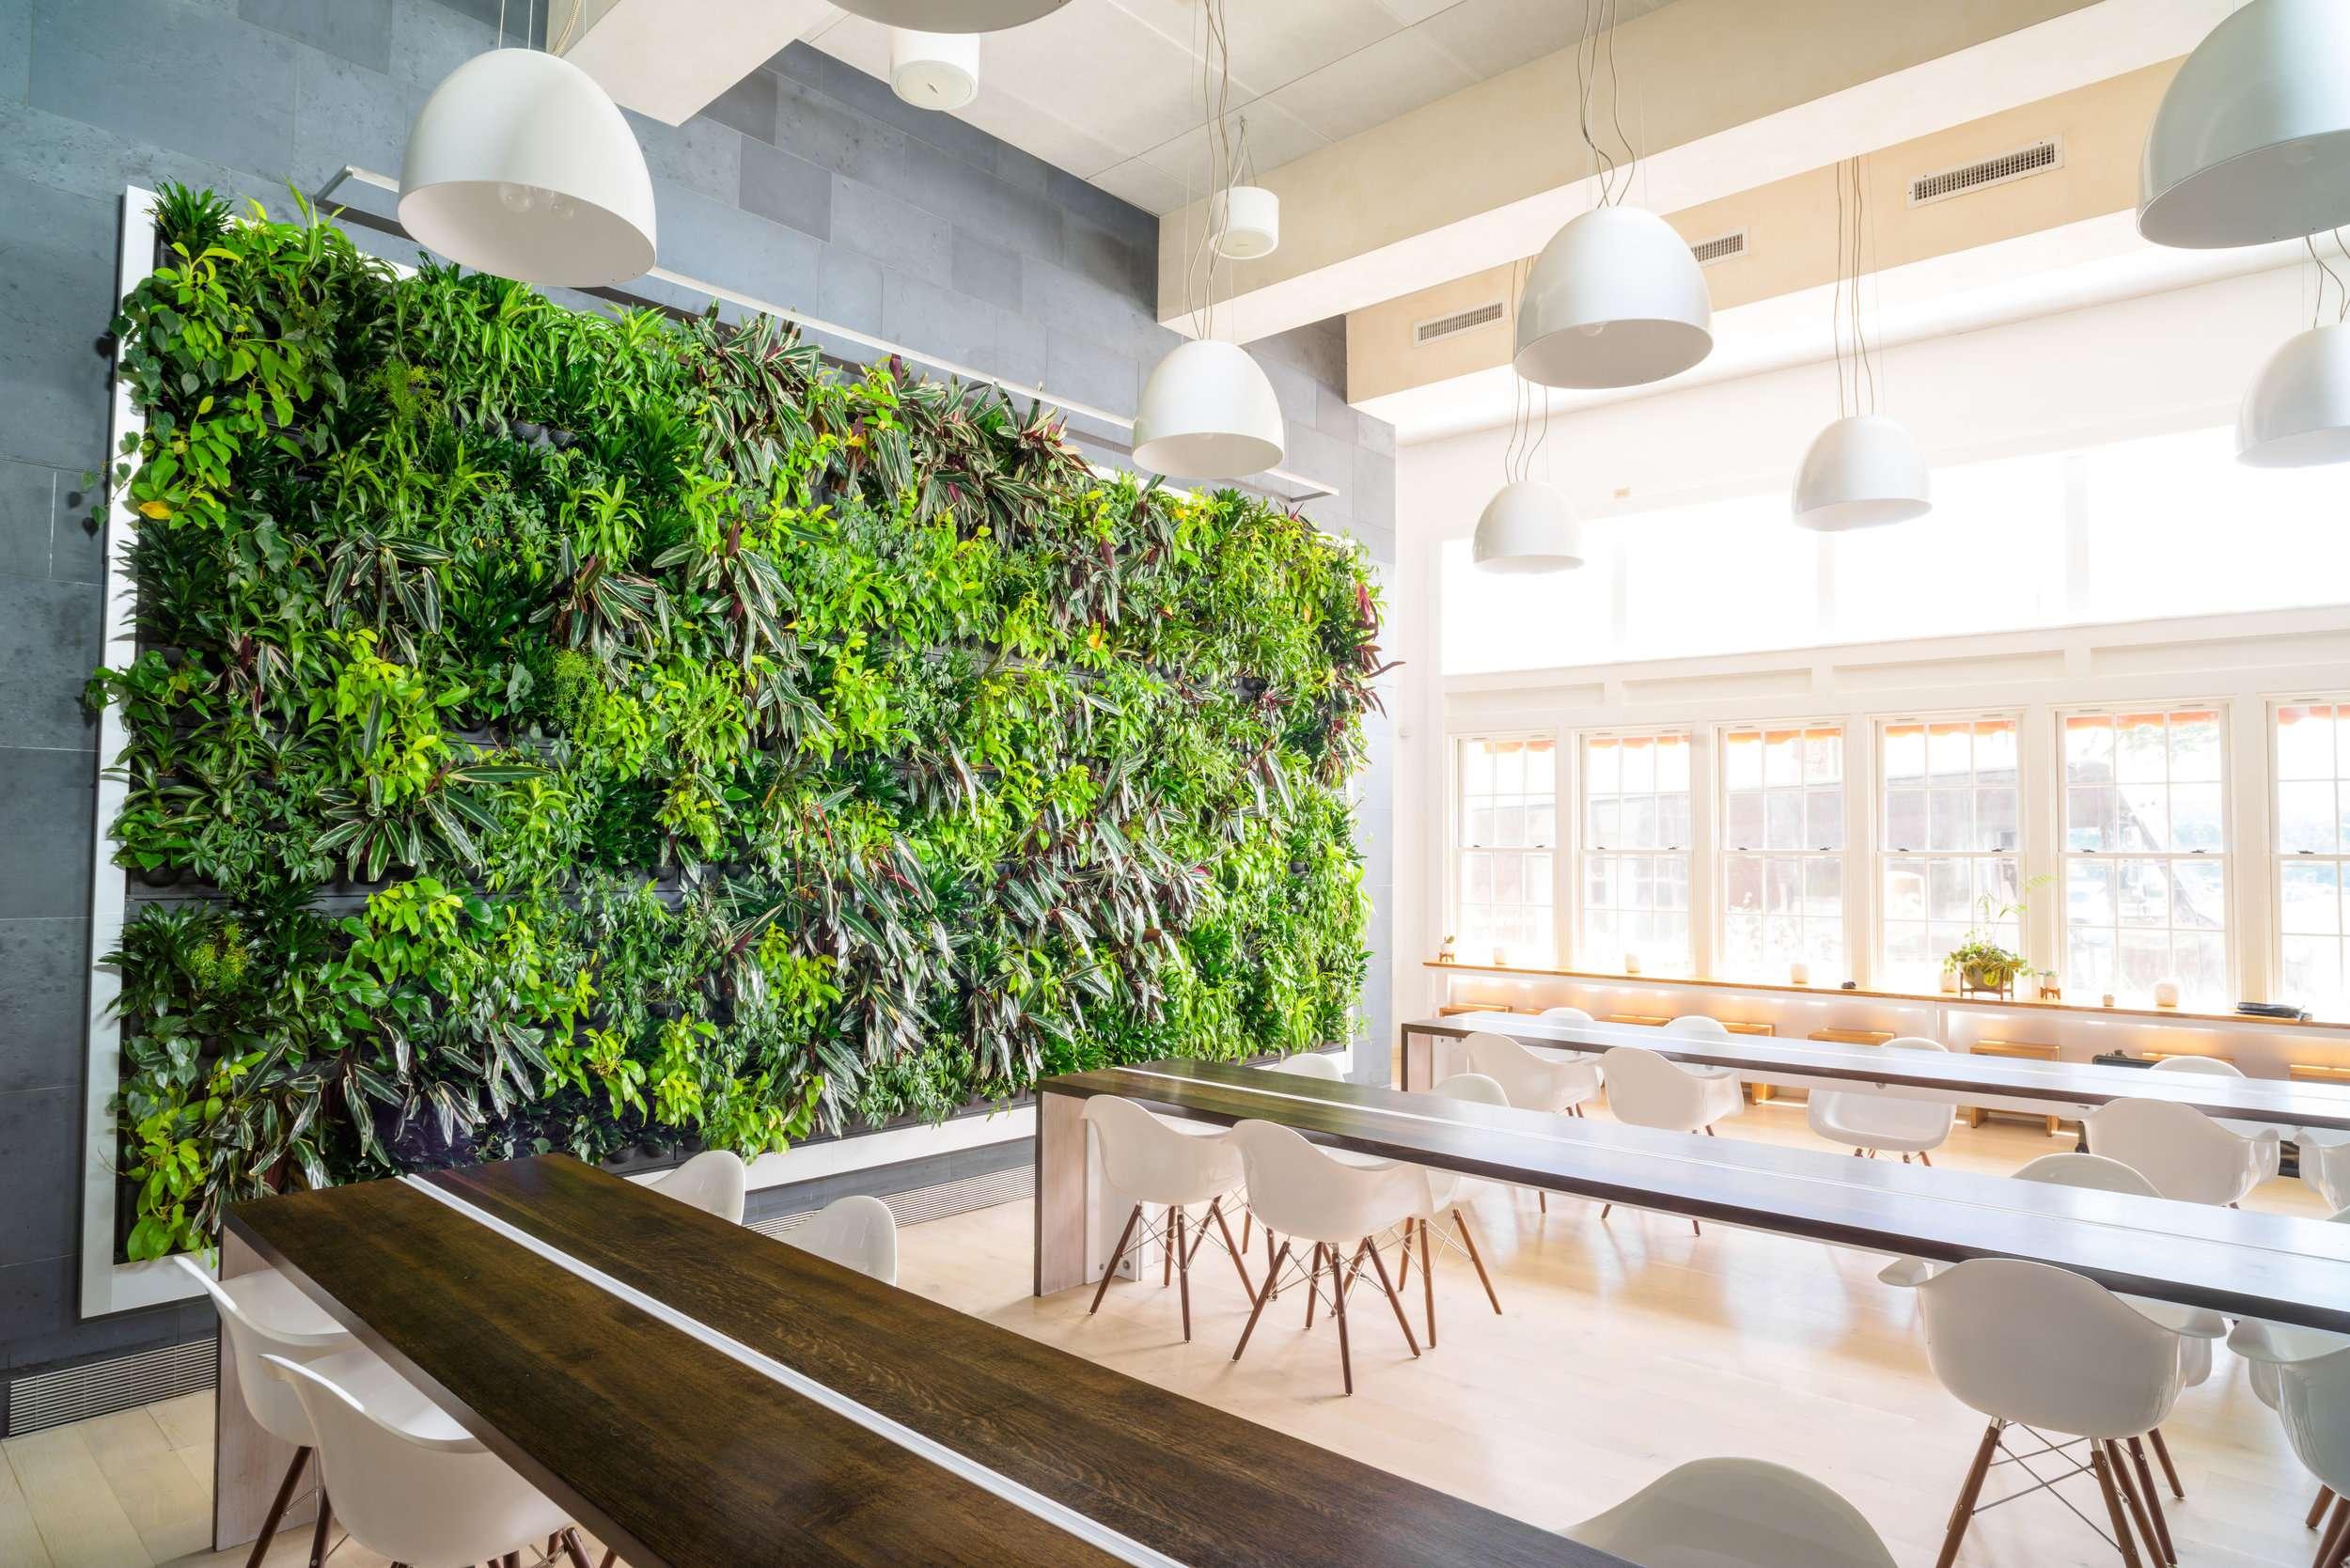 groen biofilie kantoor dutchgraph